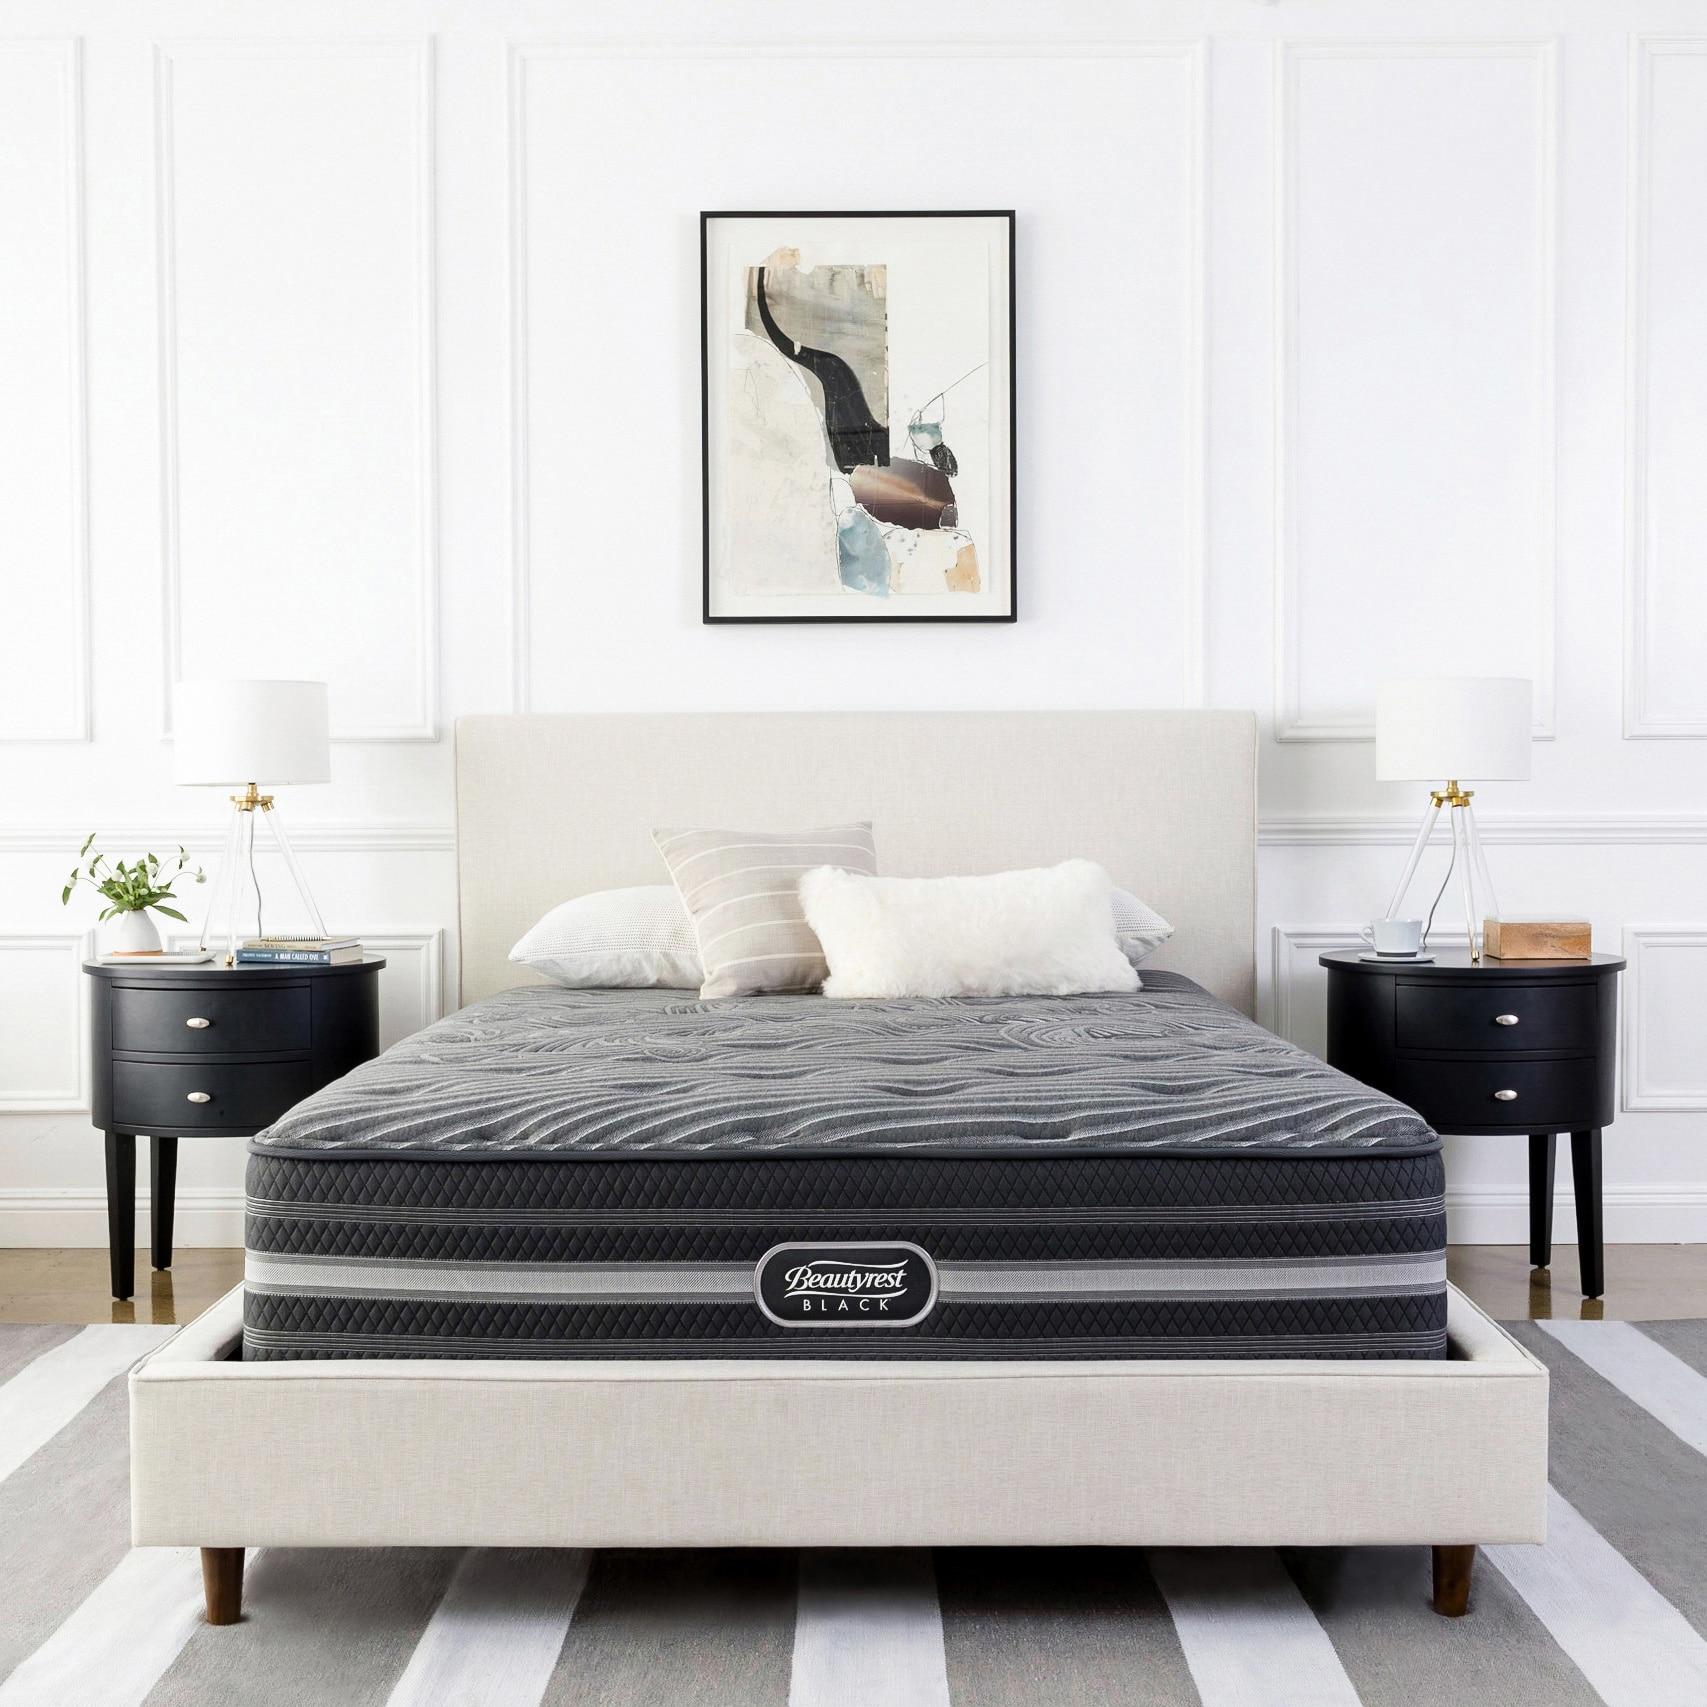 Beautyrest Black Natasha Plush Pillow Top Queen Size Mattress Set Free Shipping Today 11872092